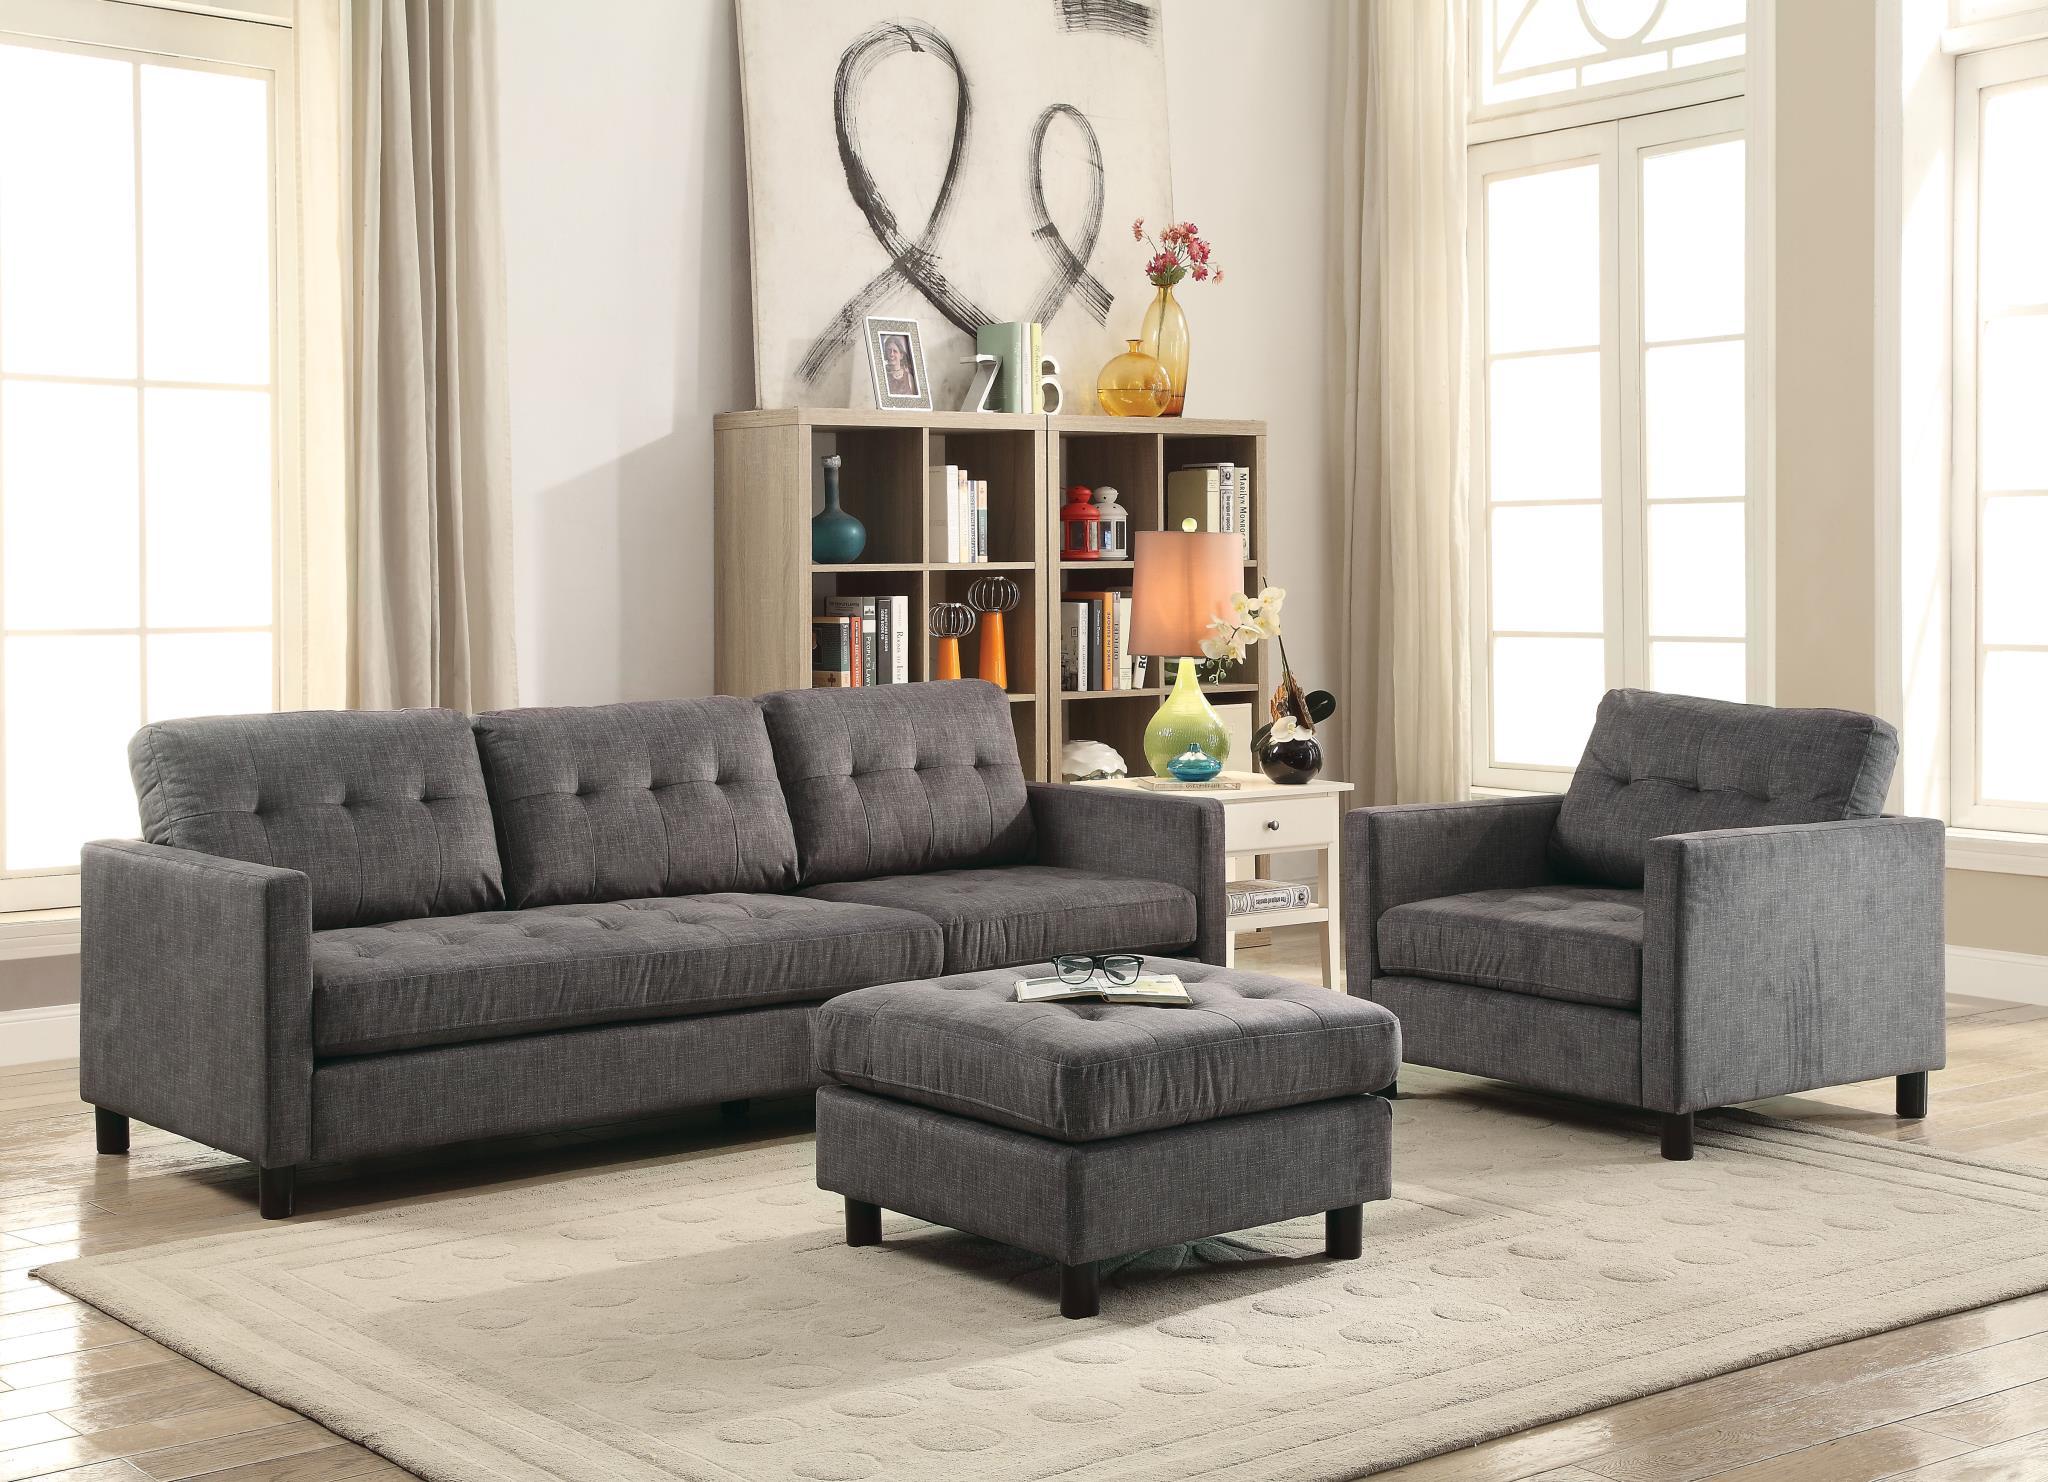 Sofa w/ Chair and Ottoman